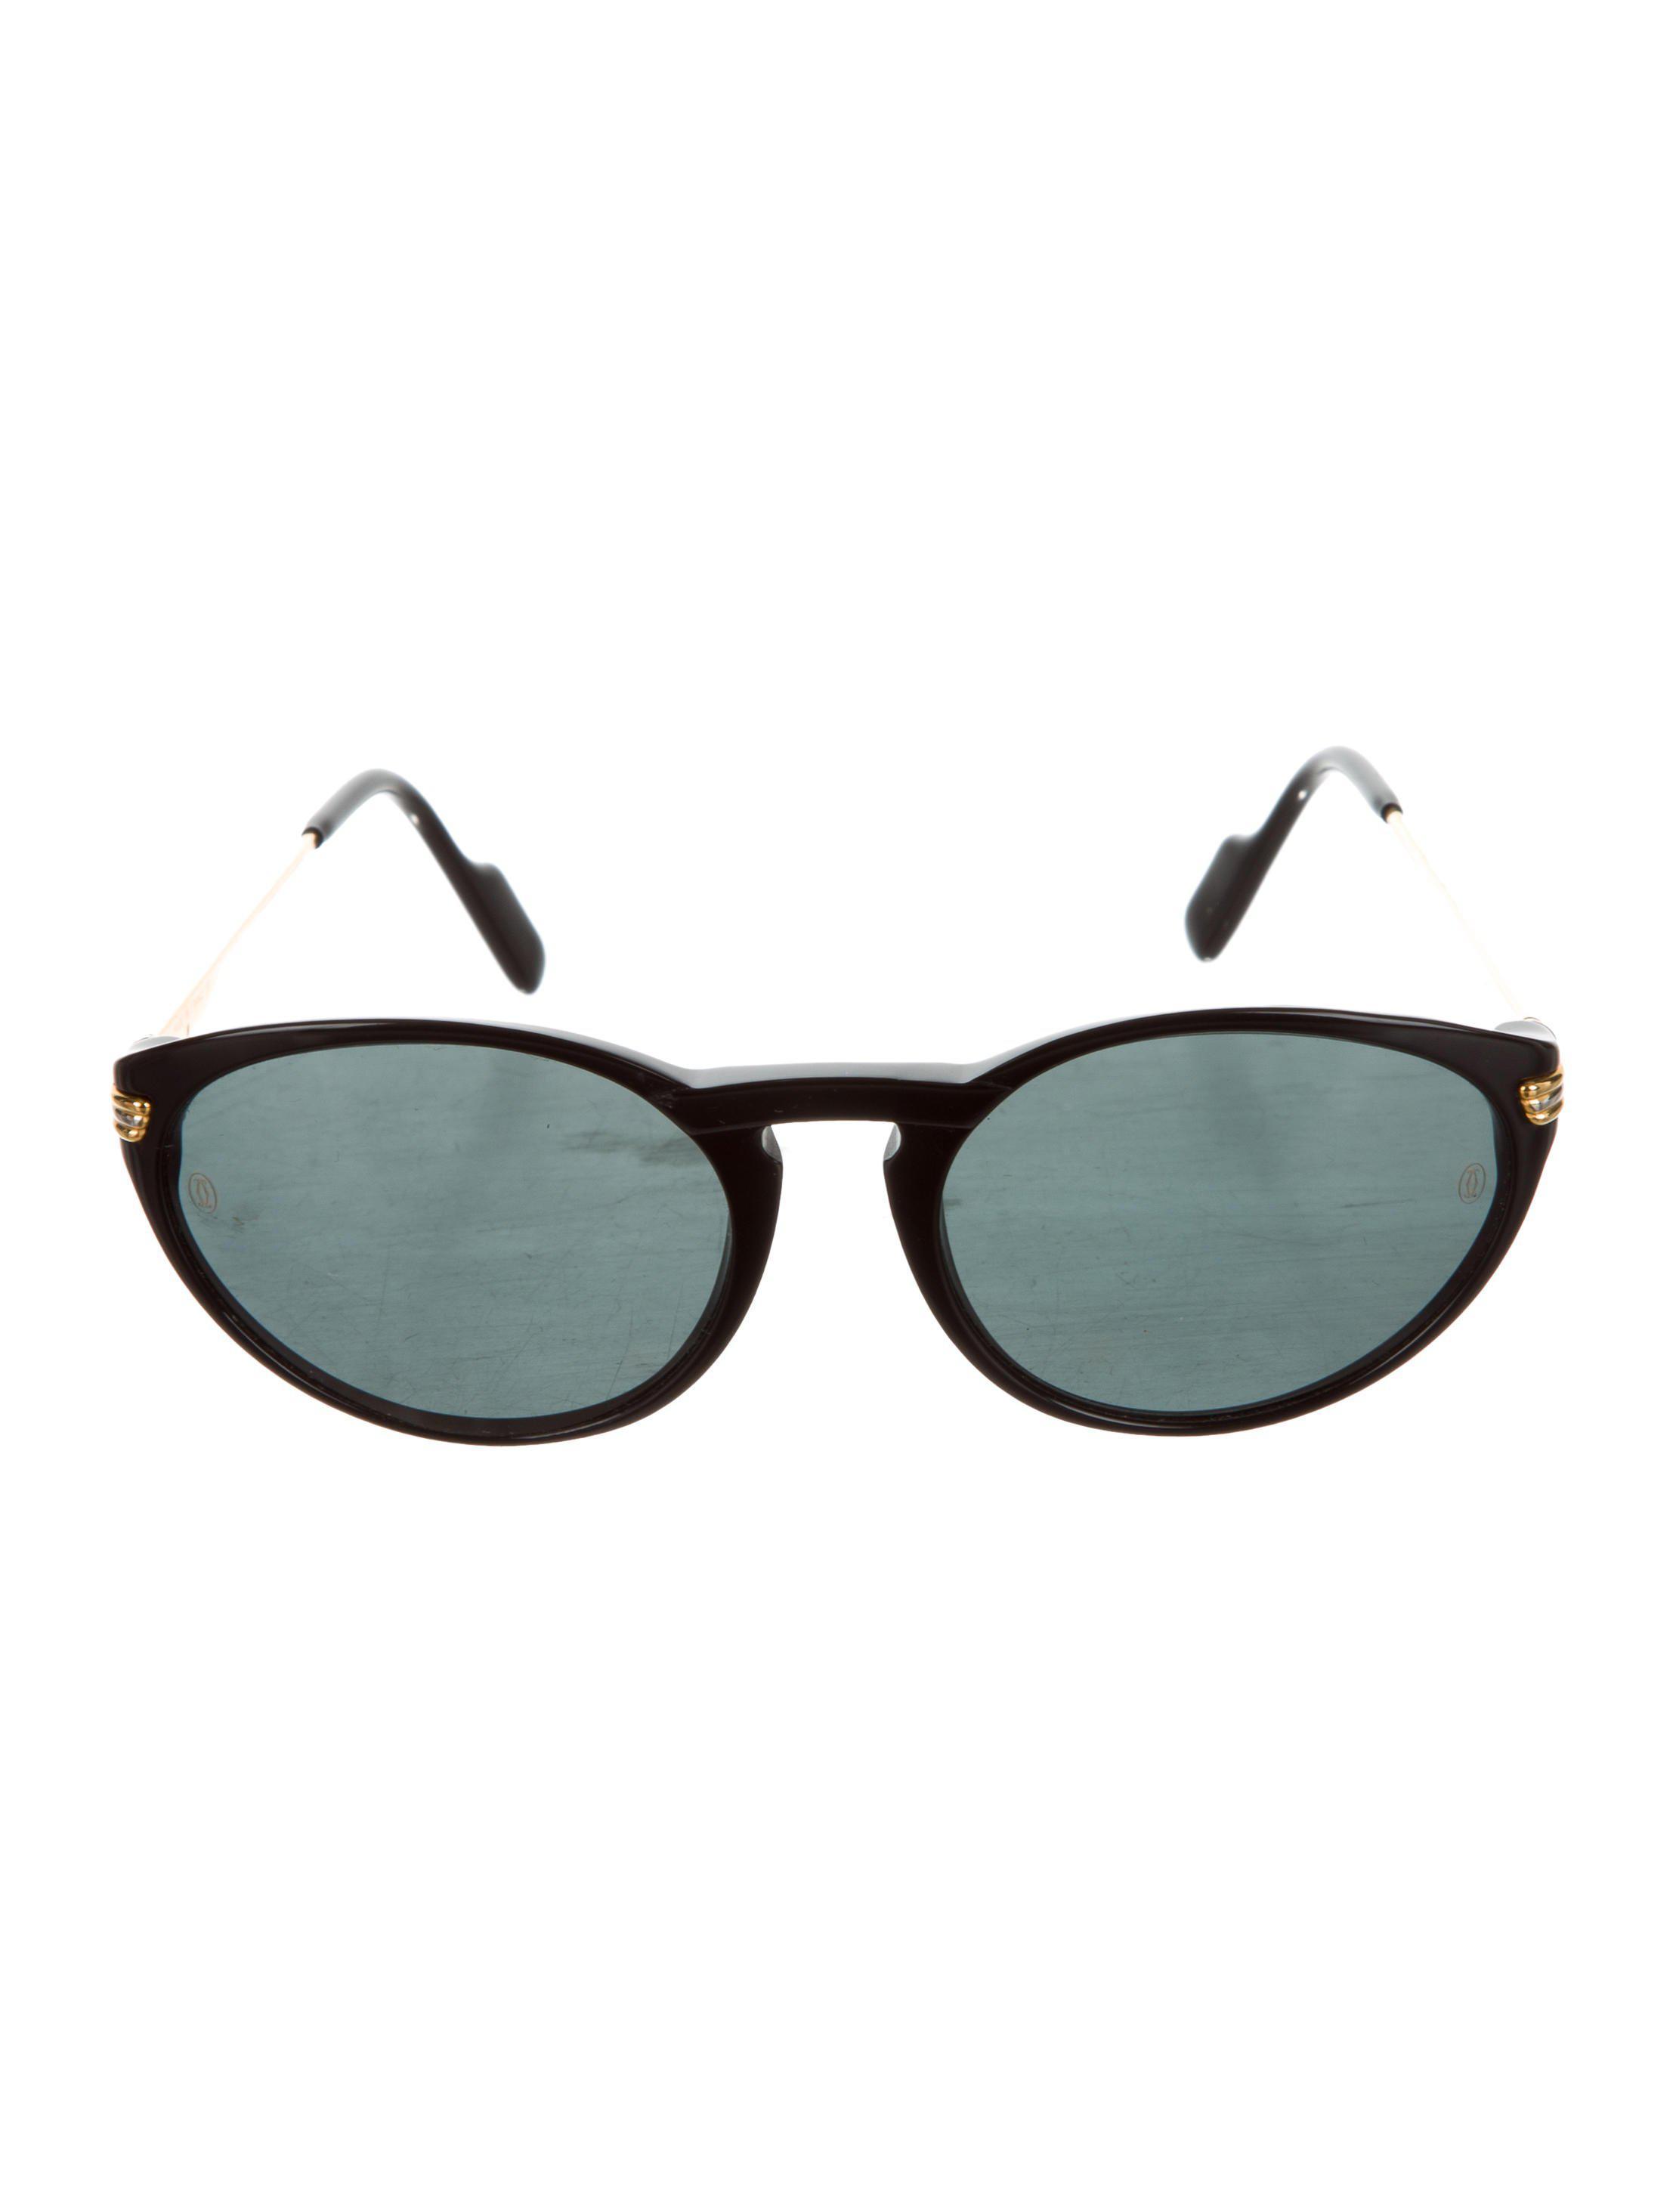 c0d75d28e59 Lyst - Cartier Tinted Round Sunglasses Black in Metallic